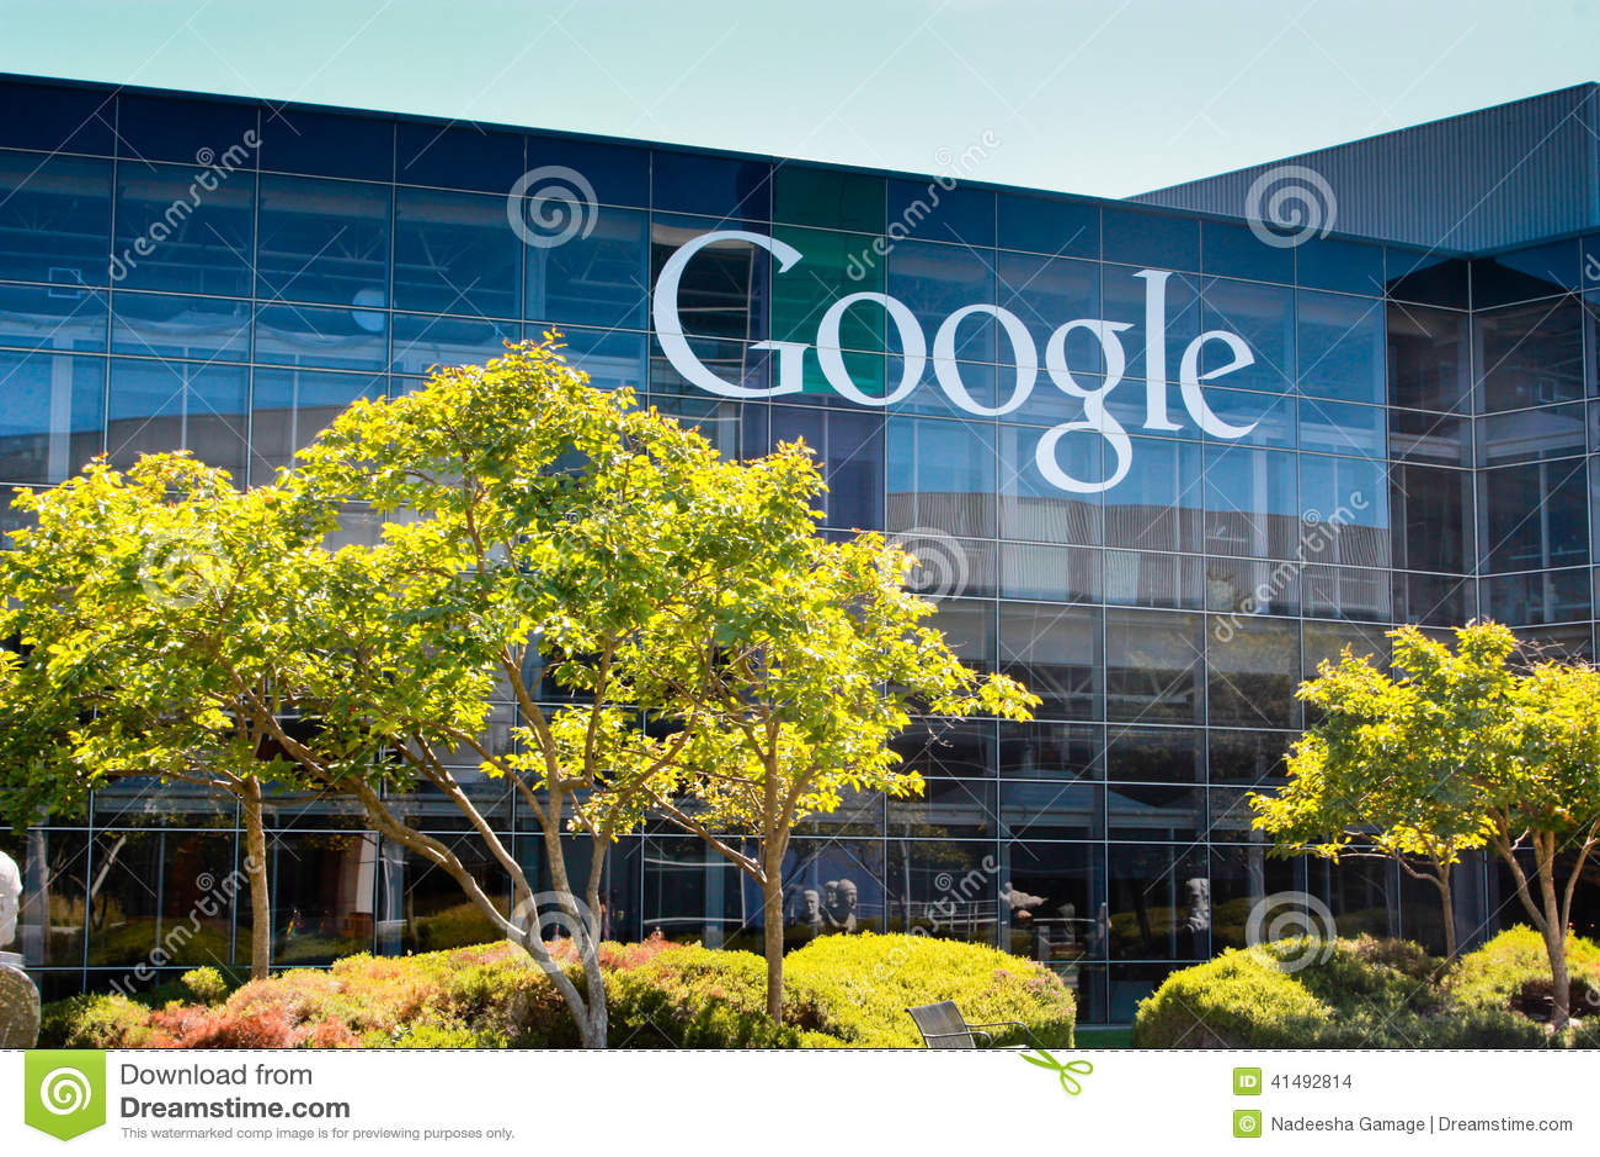 Google Corporate Headquarters Editorial Stock Image - Image: 41492814